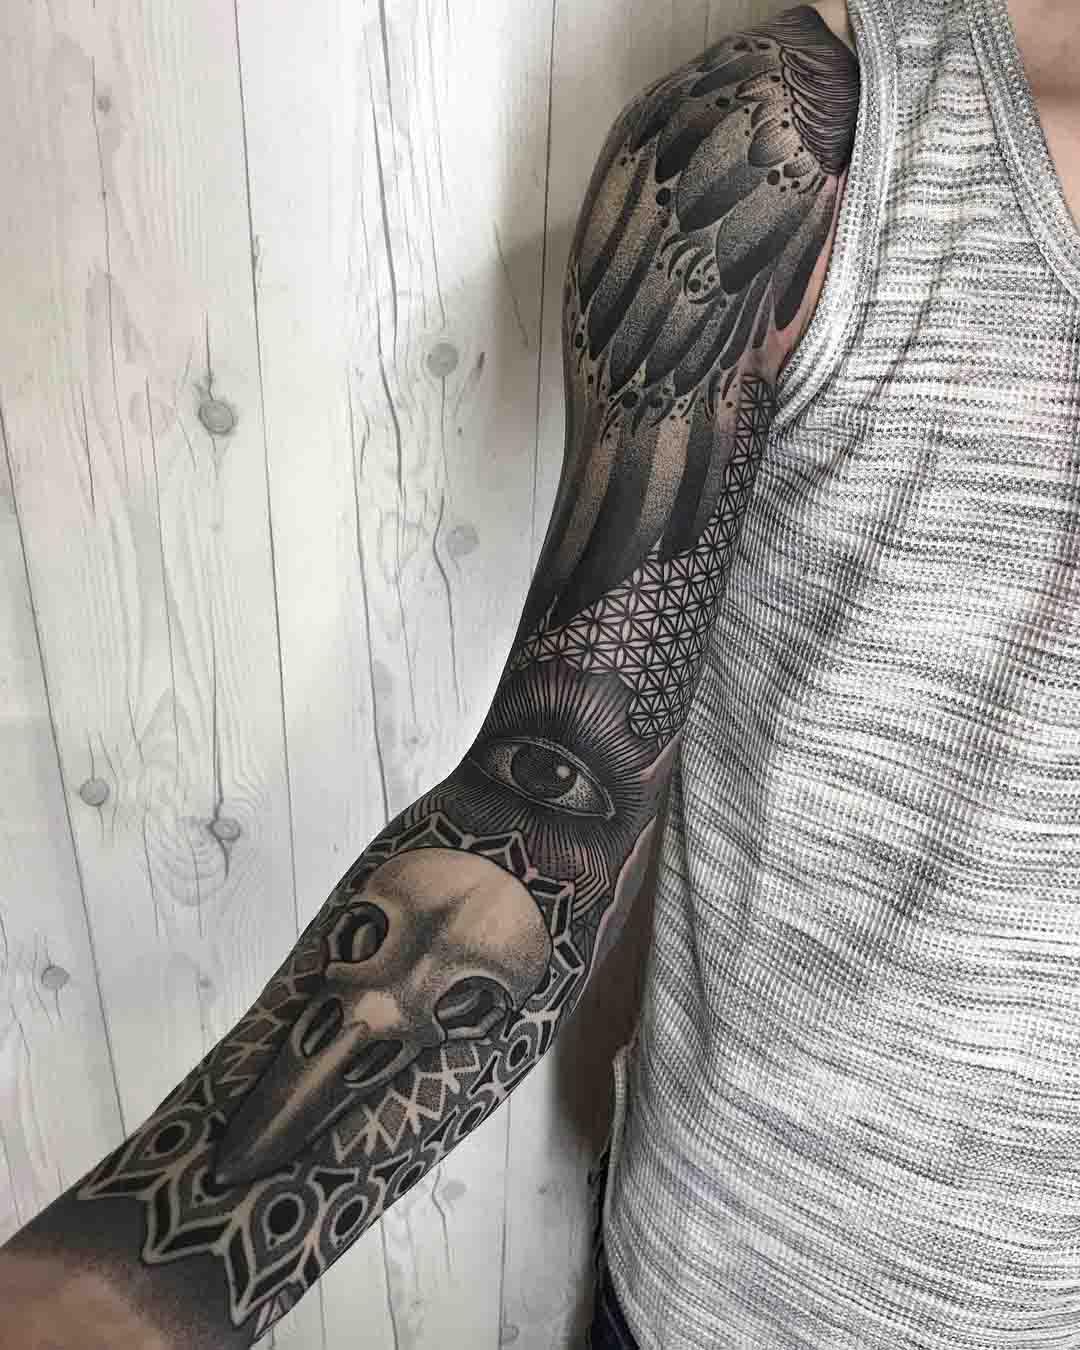 tattoo sleeve dotwork style